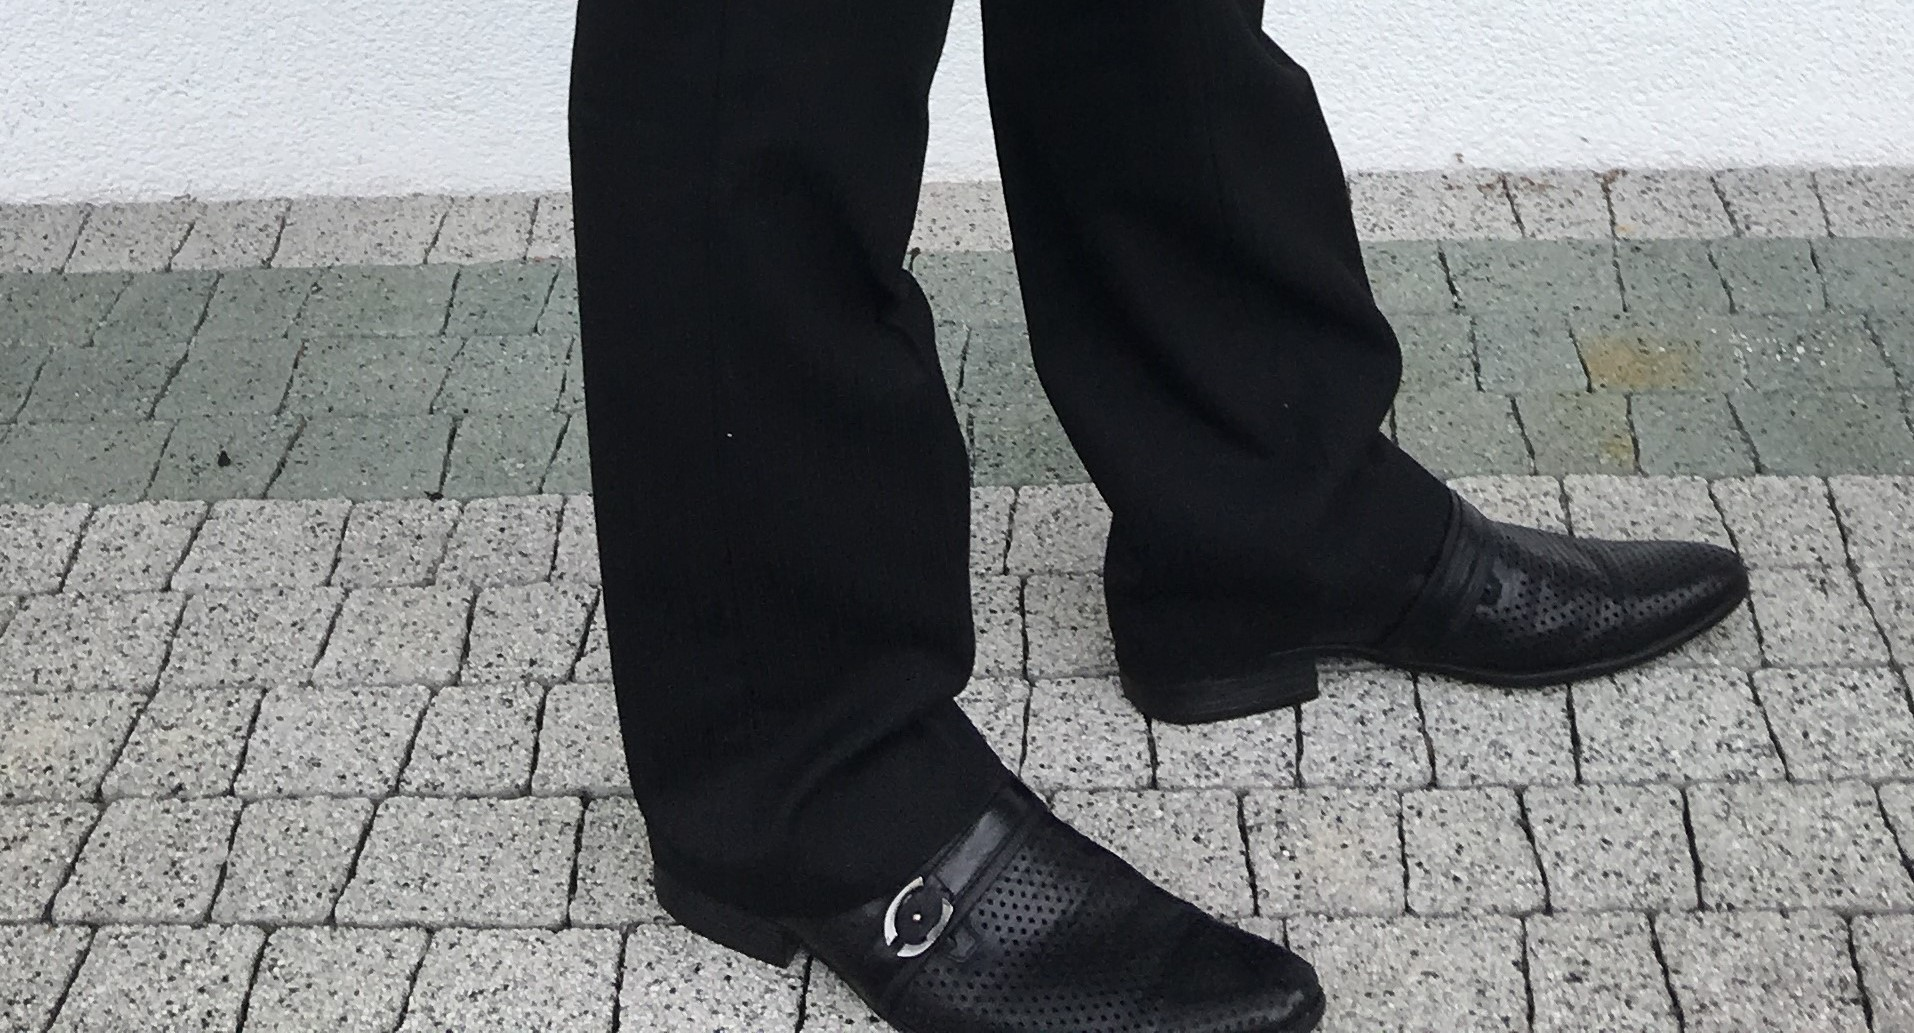 ede1d7eef1e18 Czarne garniturowe buty 41 dziurki j nowe - 7342689948 - oficjalne ...